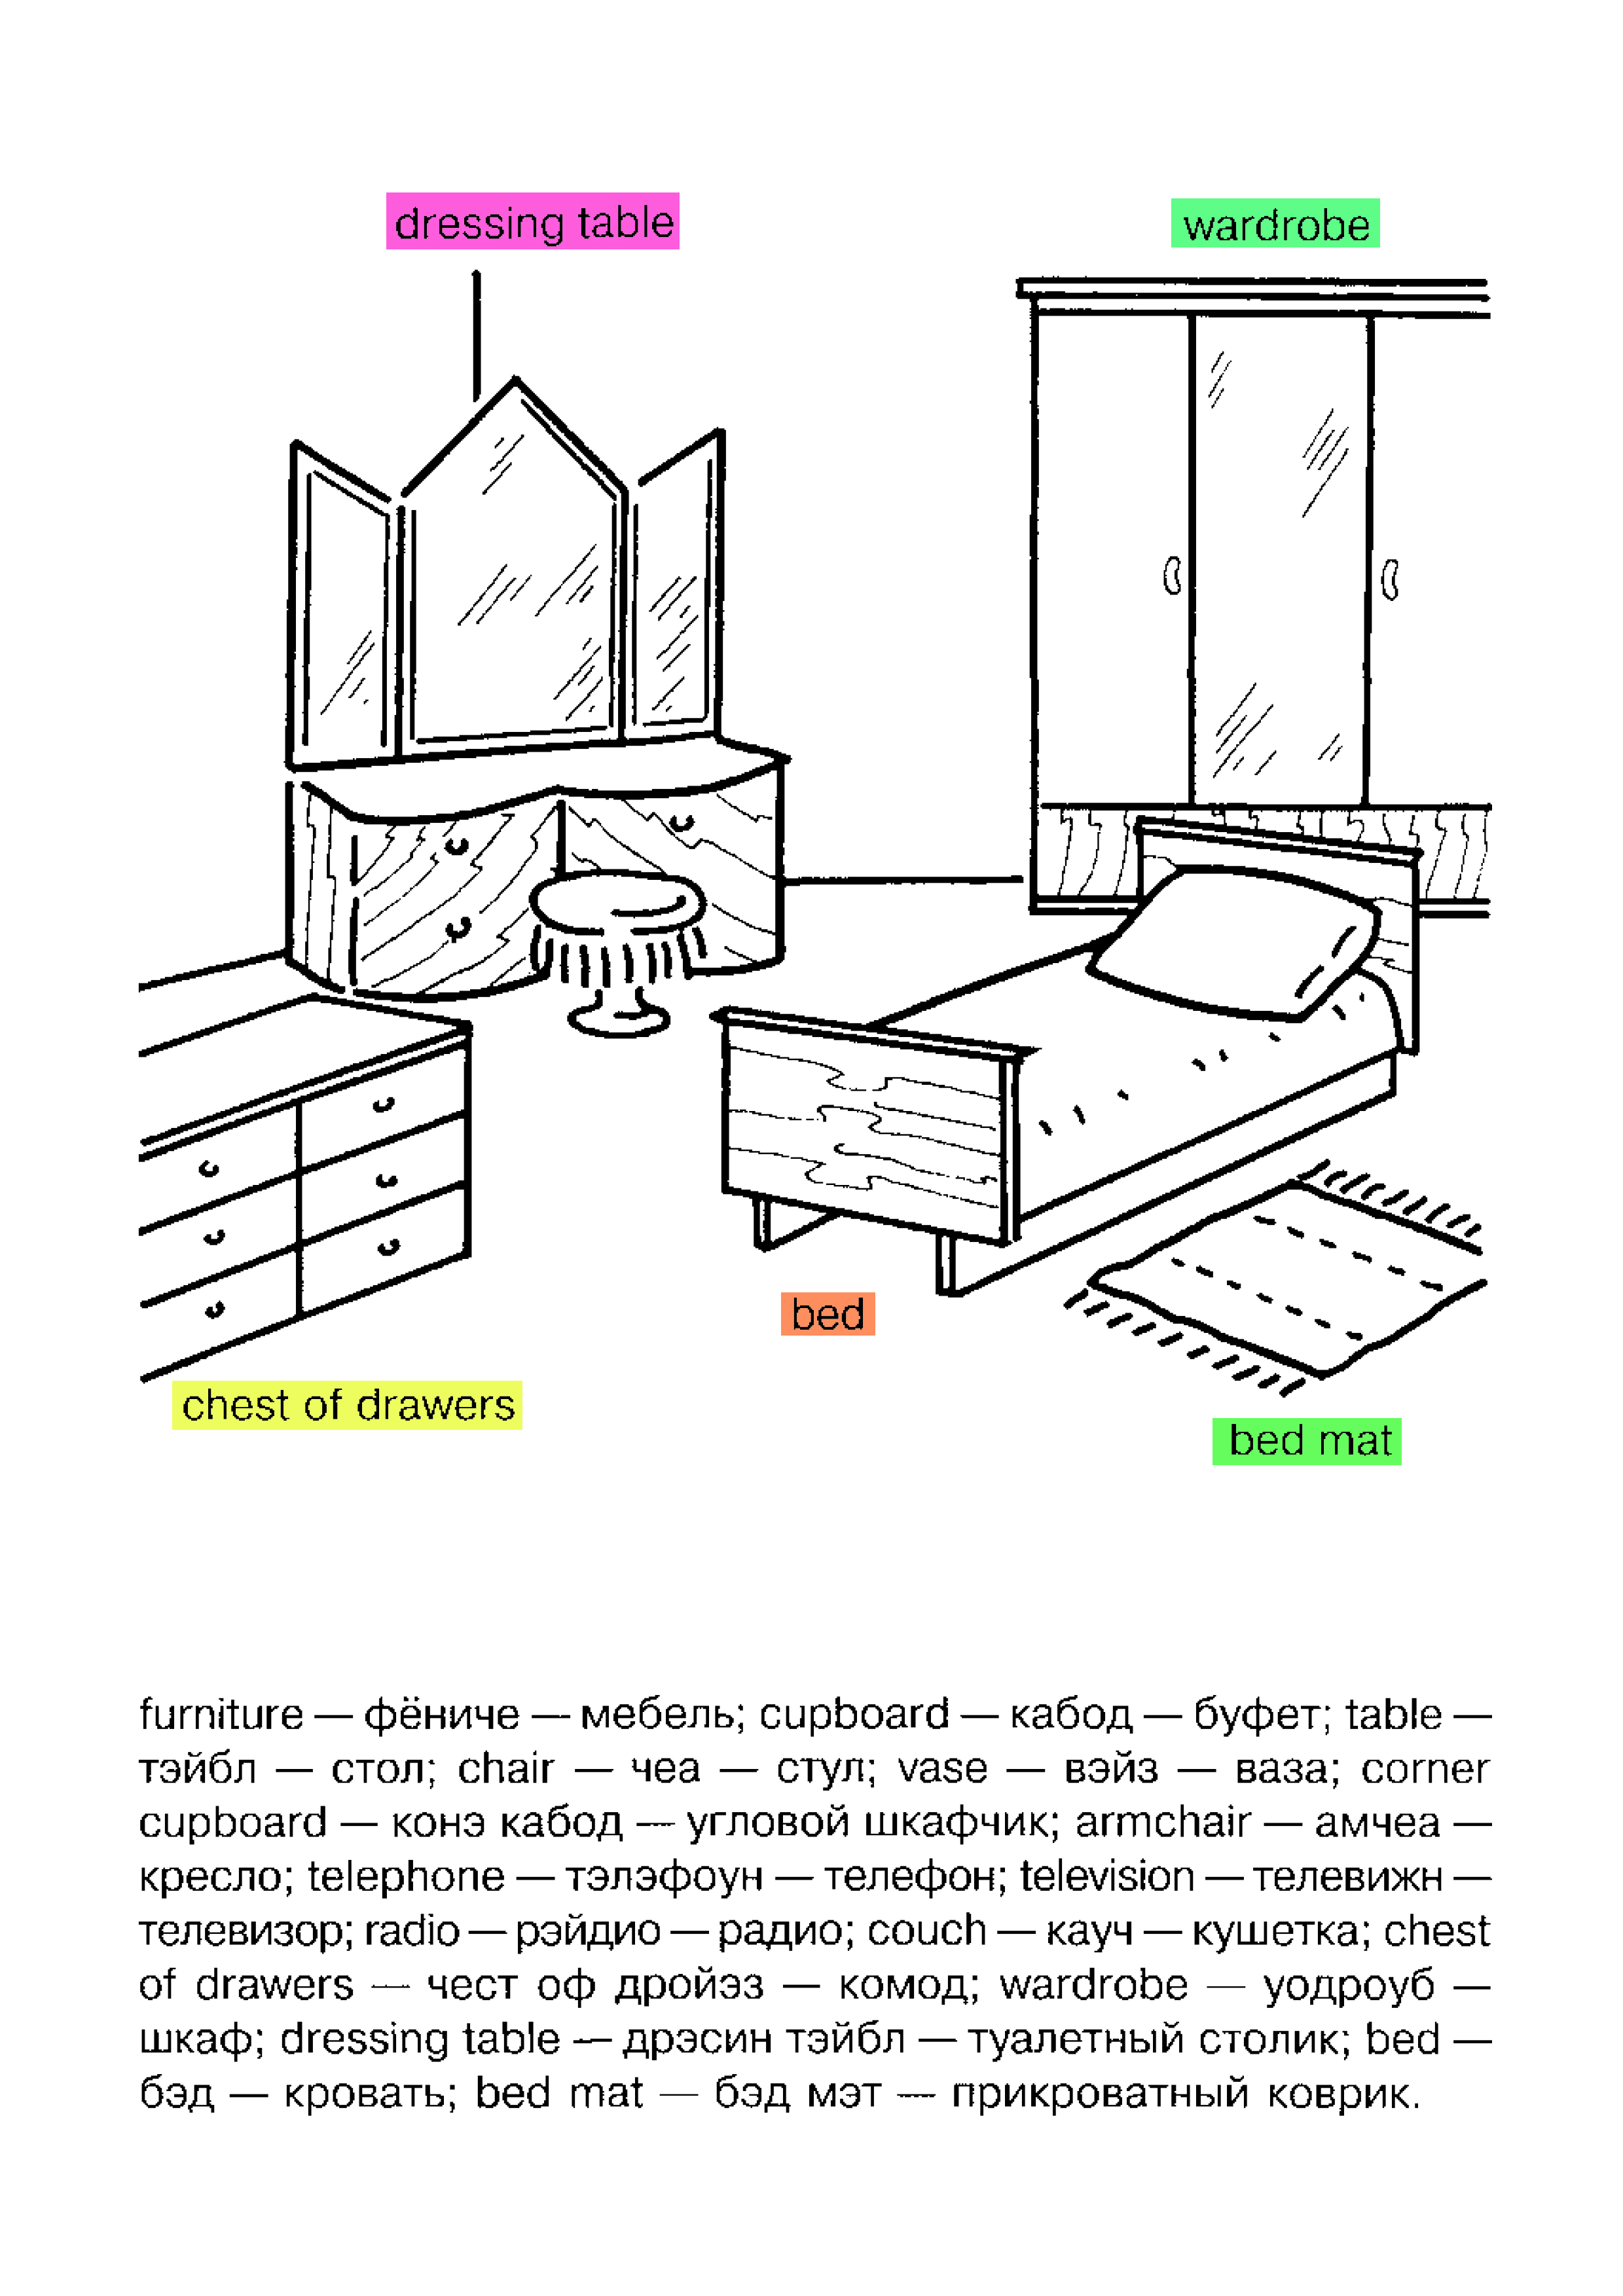 [www.baraholshik.com]_RASKRASKA_Uchim_angliyskiy_(HQ,2006,33c.)#